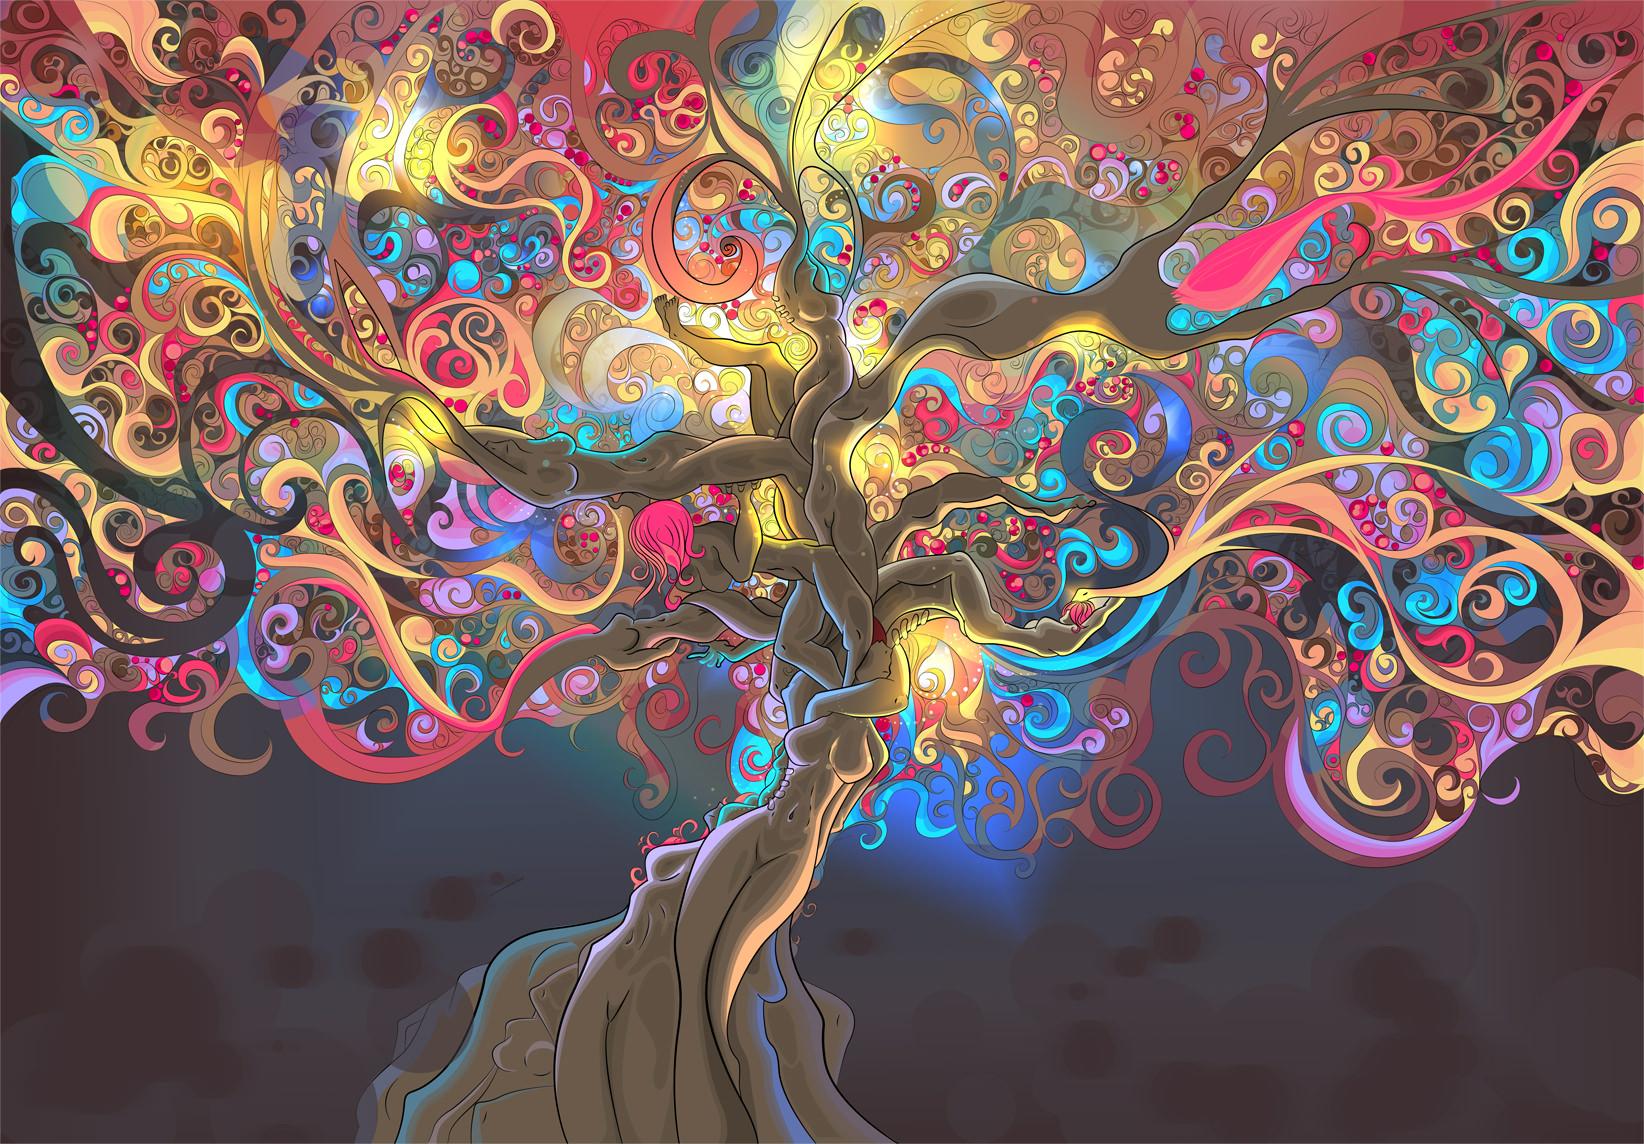 Amazing Trippy Wallpaper